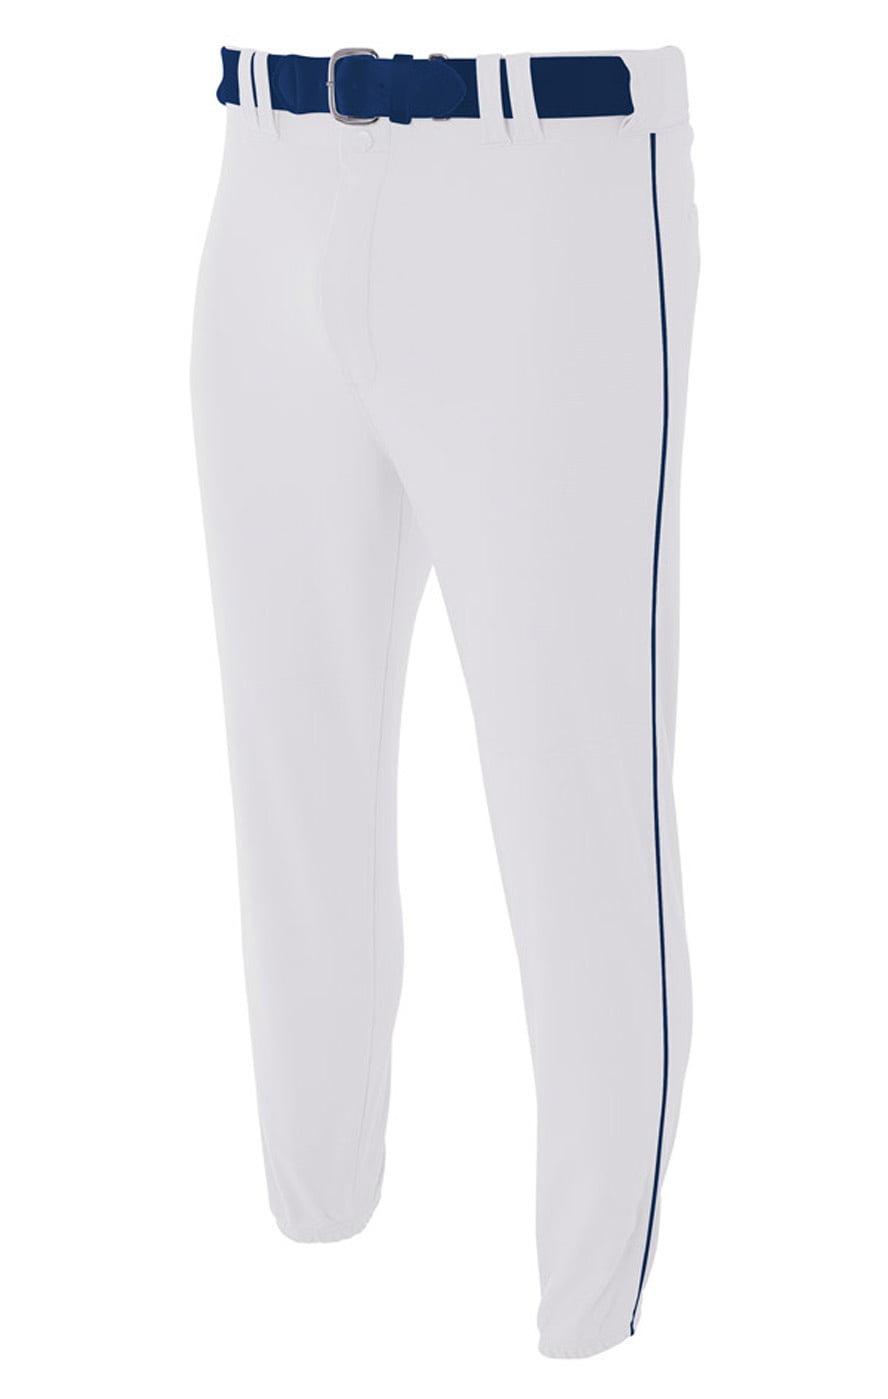 Pro Style Elastic Bottom Baseball Pant by A4